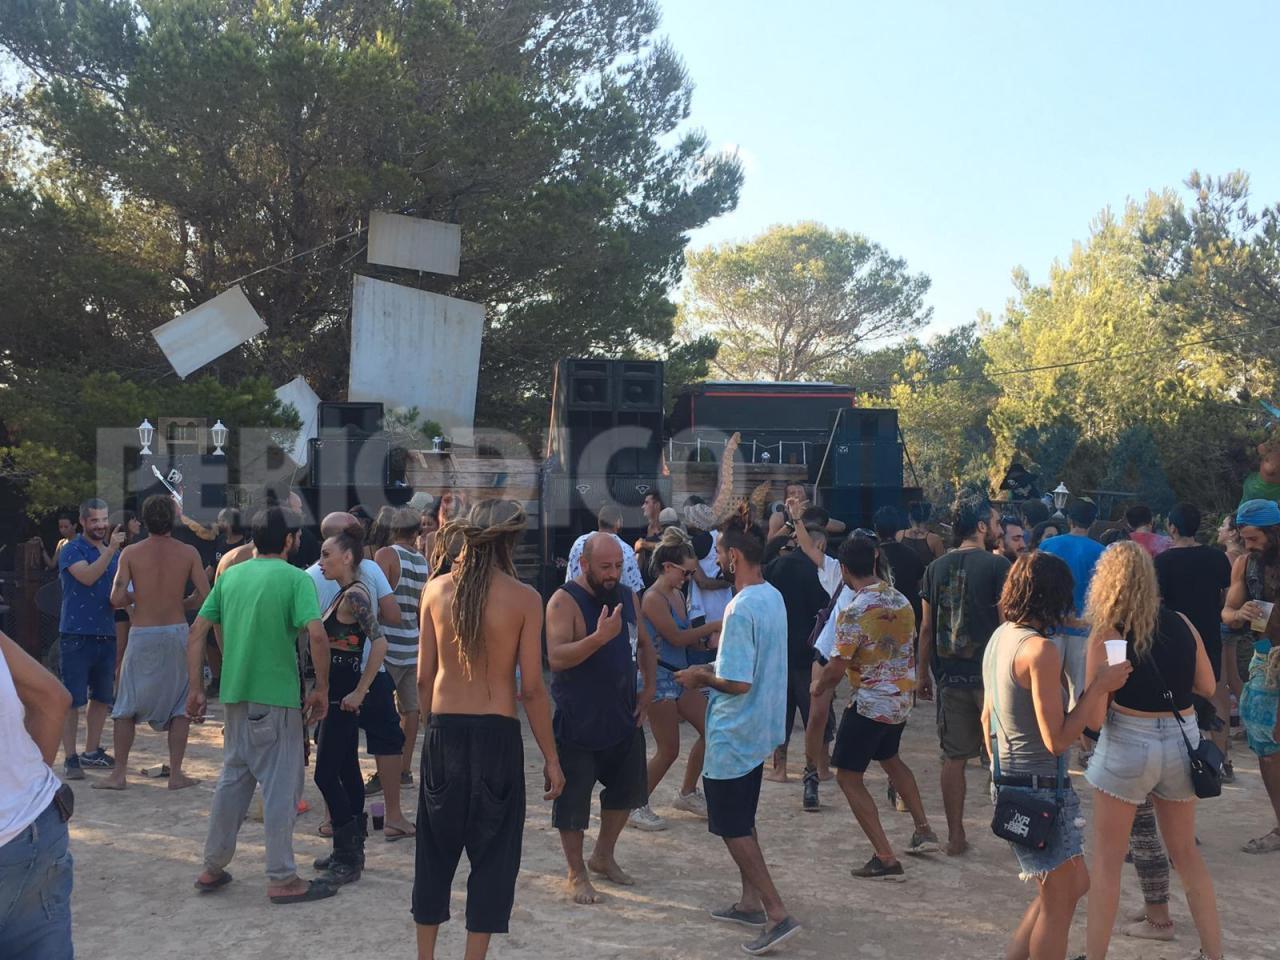 La Guardia Civil desmantela una fiesta ilegal en Ibiza